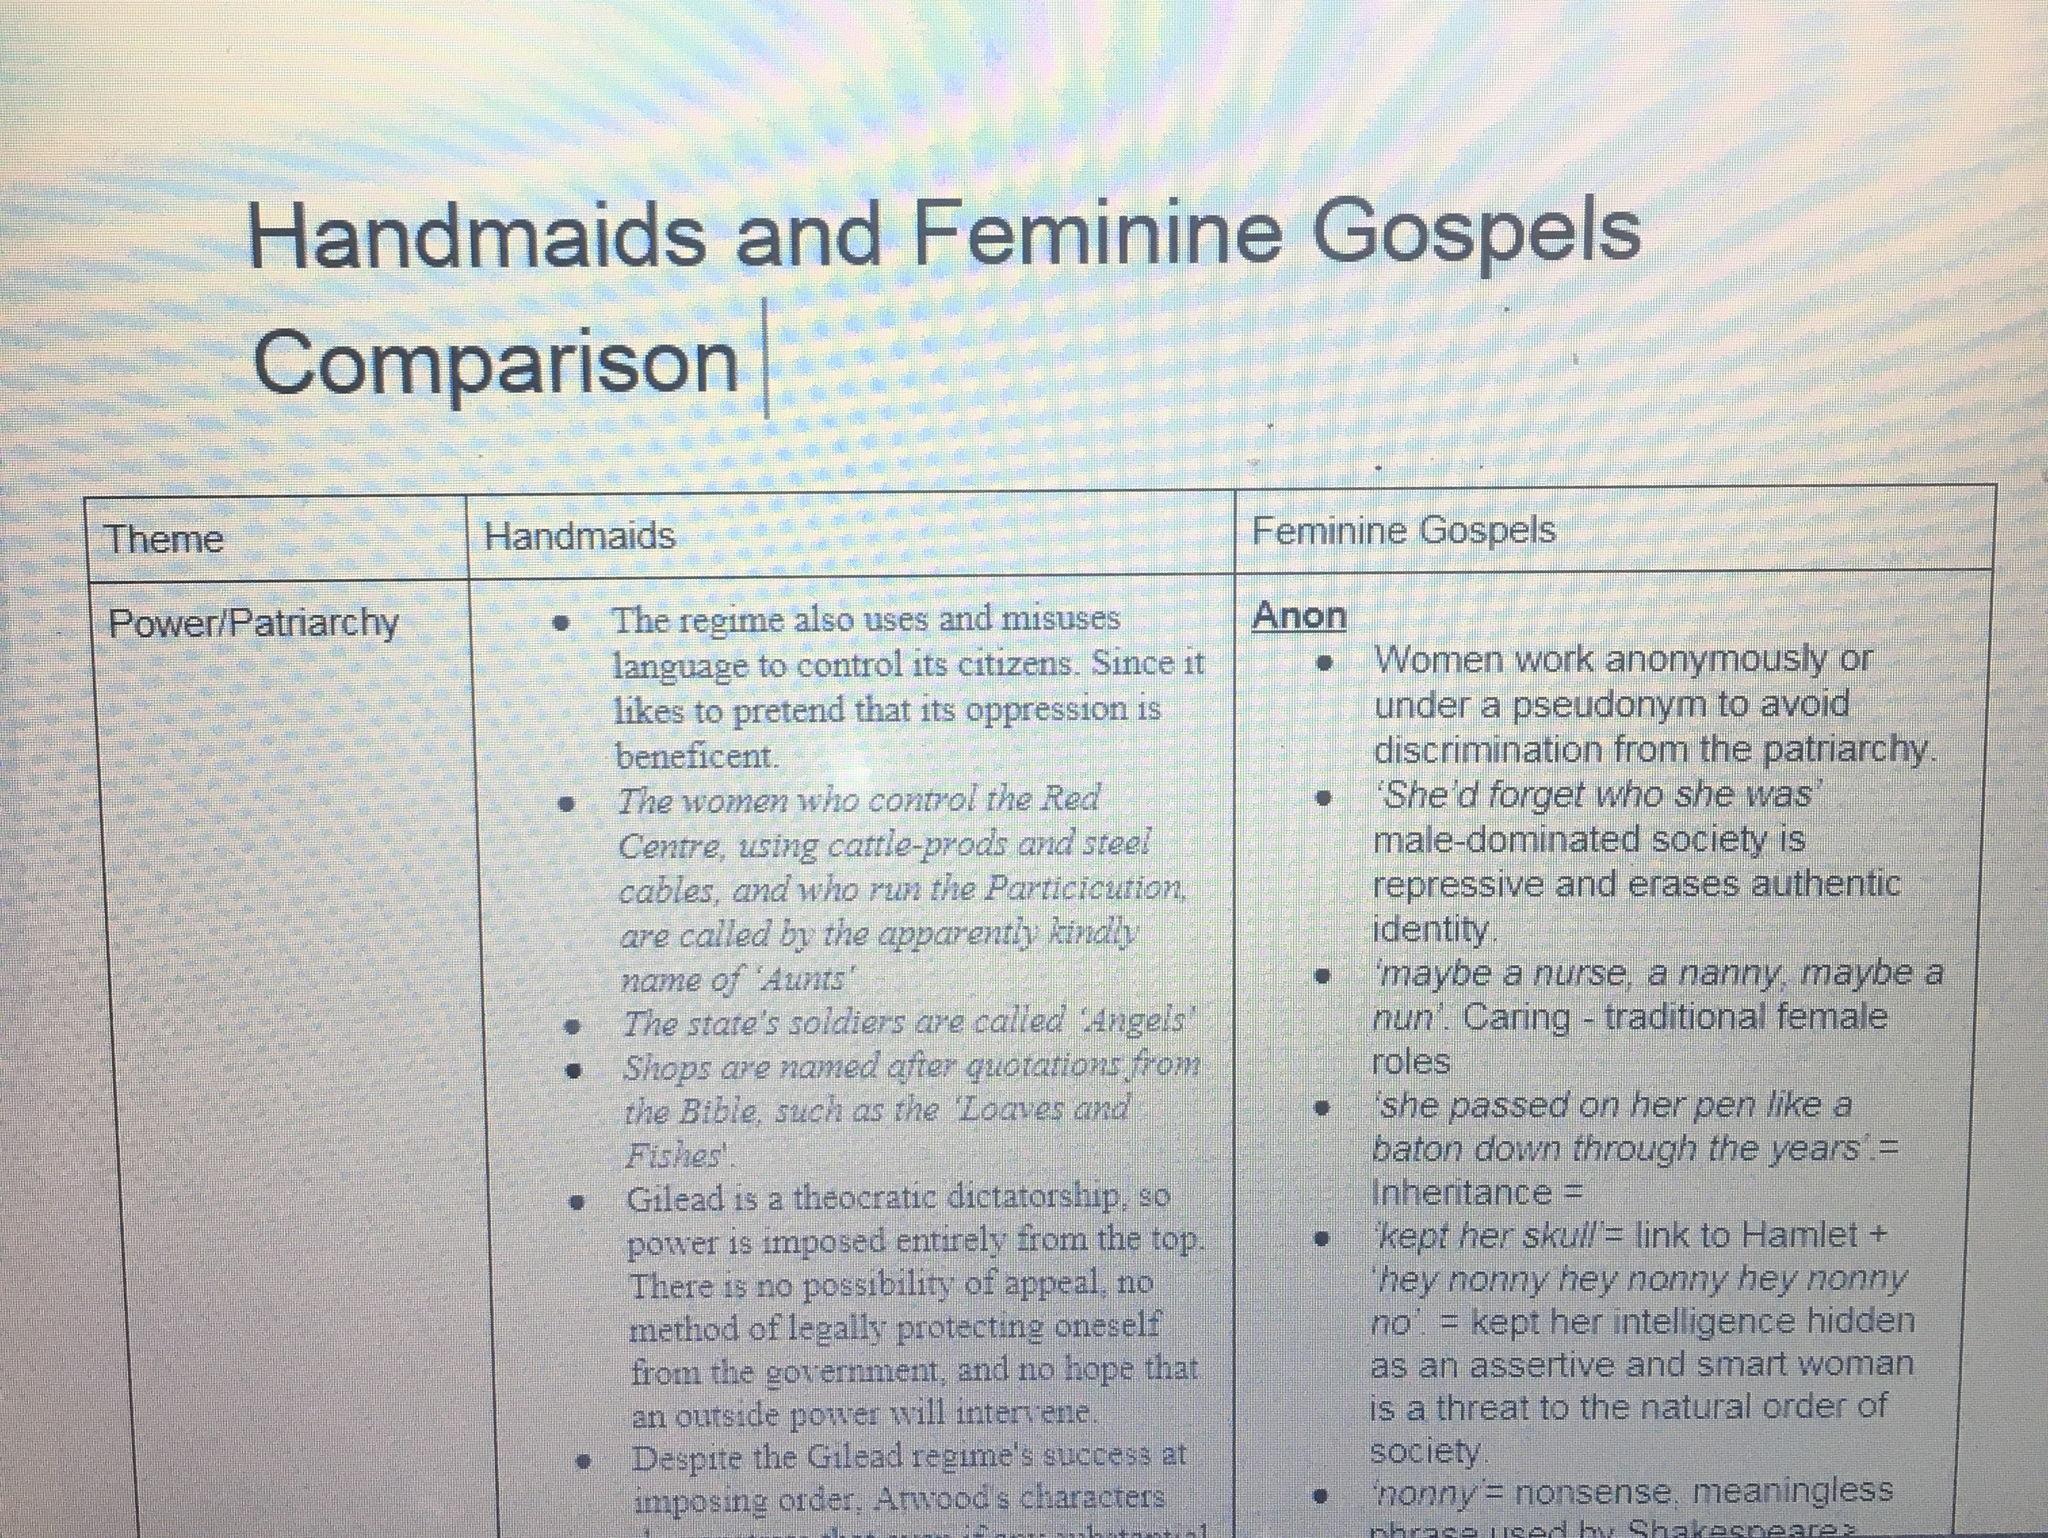 Handmaid's Tale and Feminine Gospels Comparison